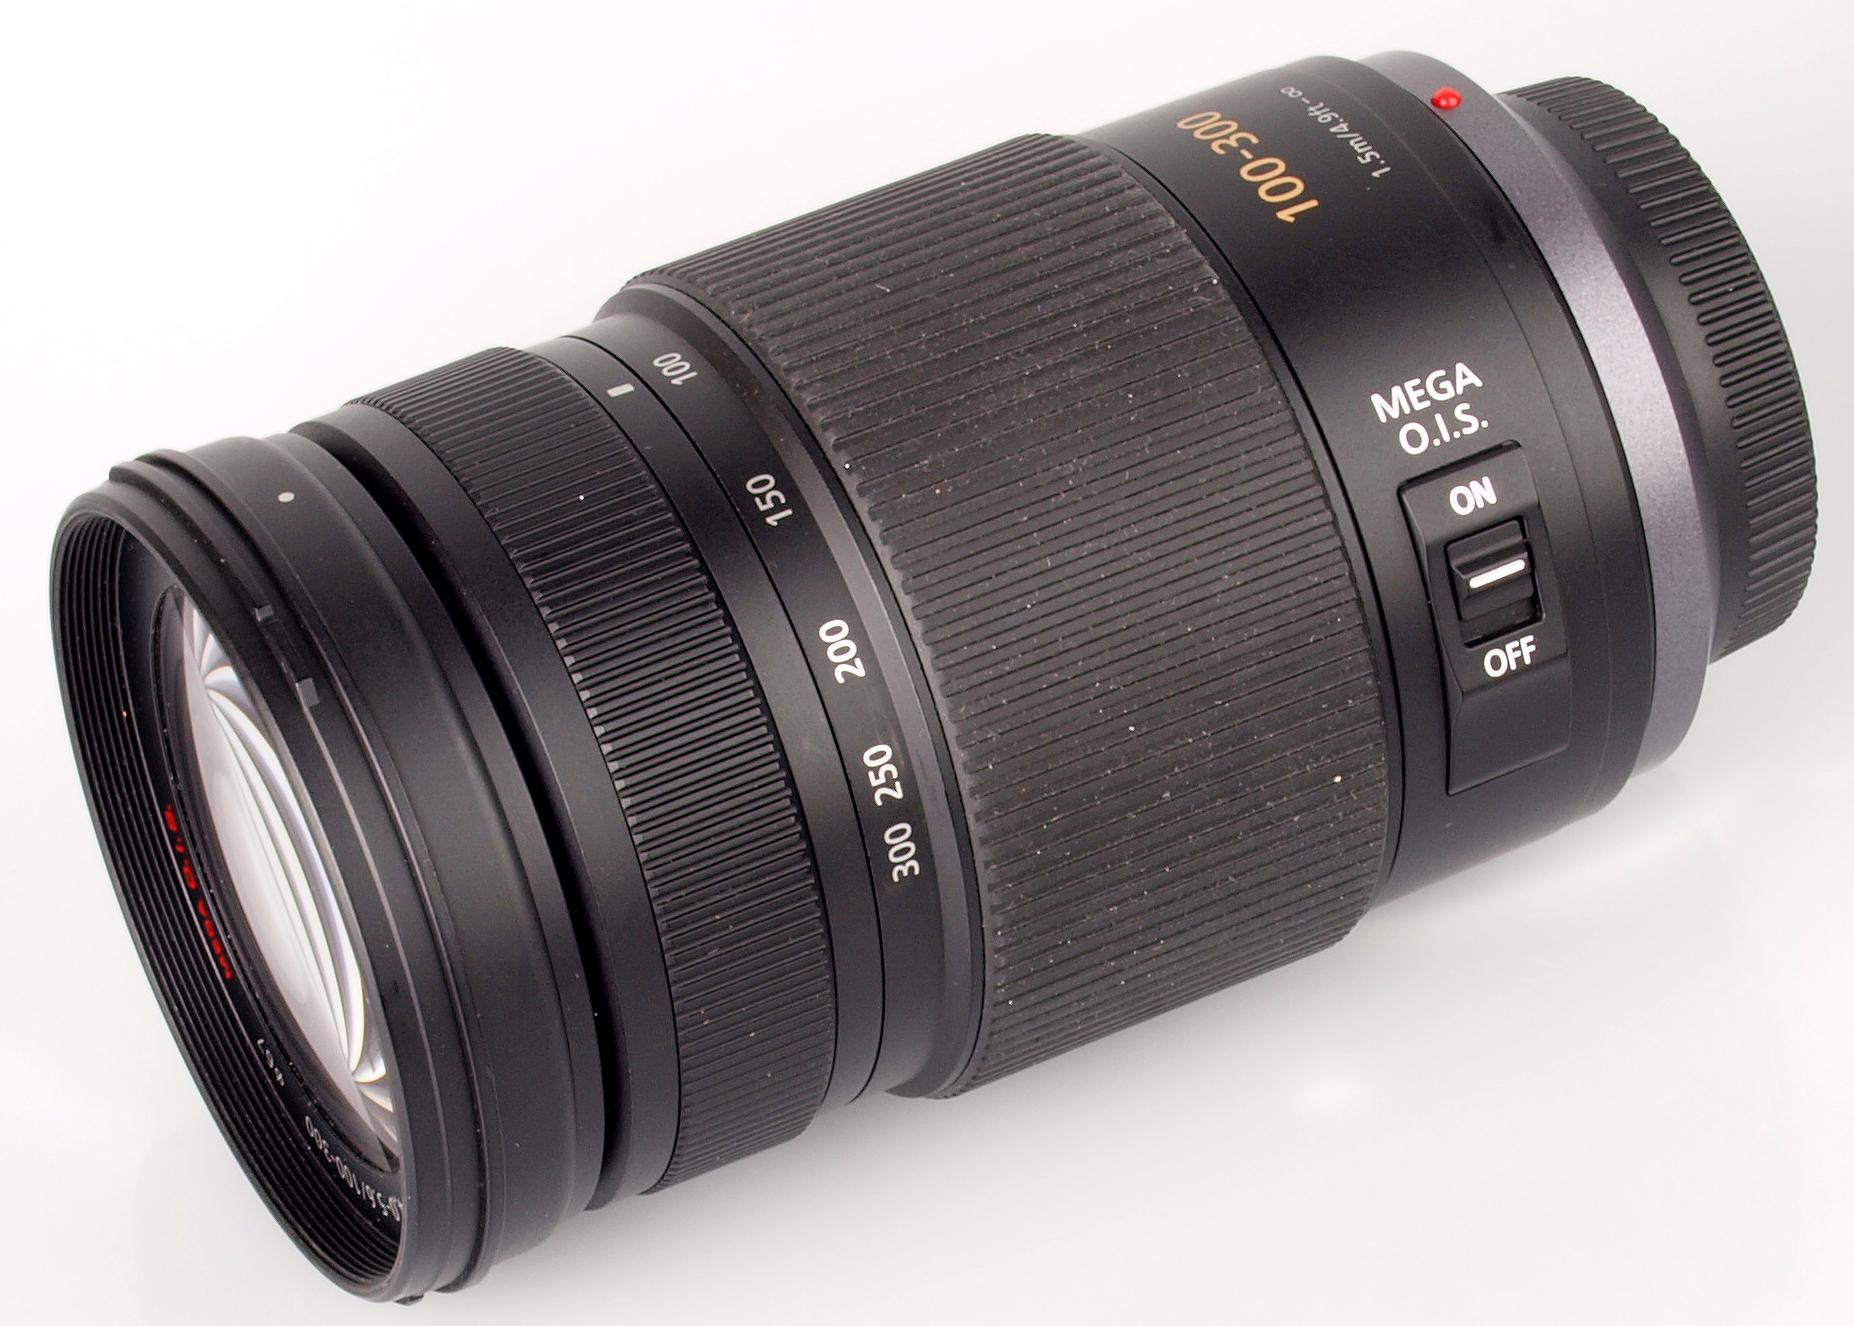 panasonic 100 300mm f4 0 5.6 ii review